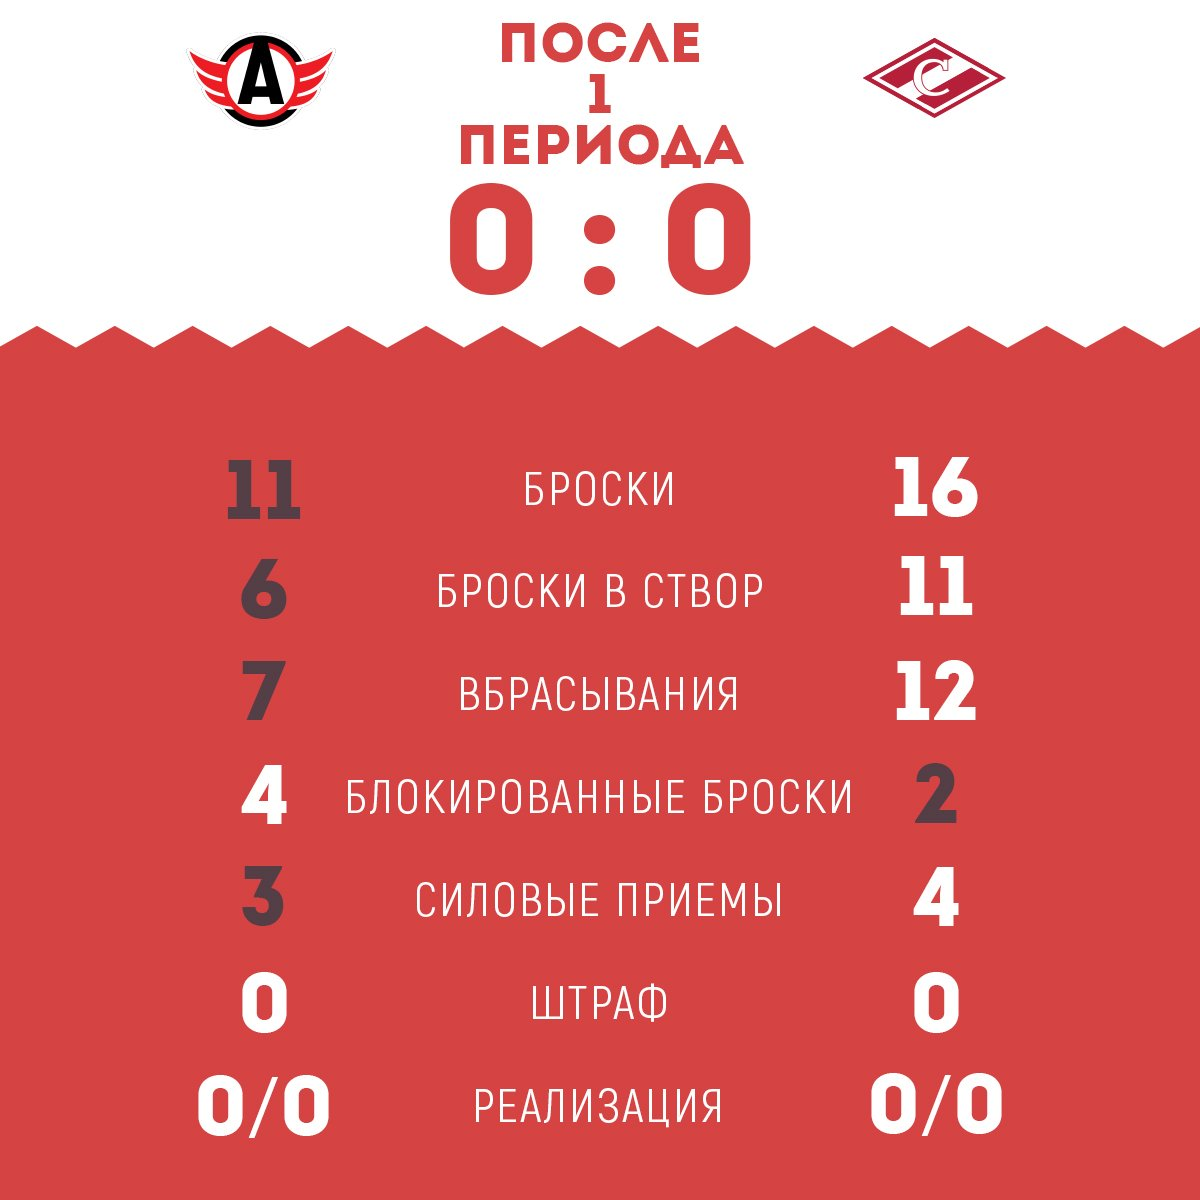 Статистика матча «Автомобилист» vs «Спартак» после 1-го периода